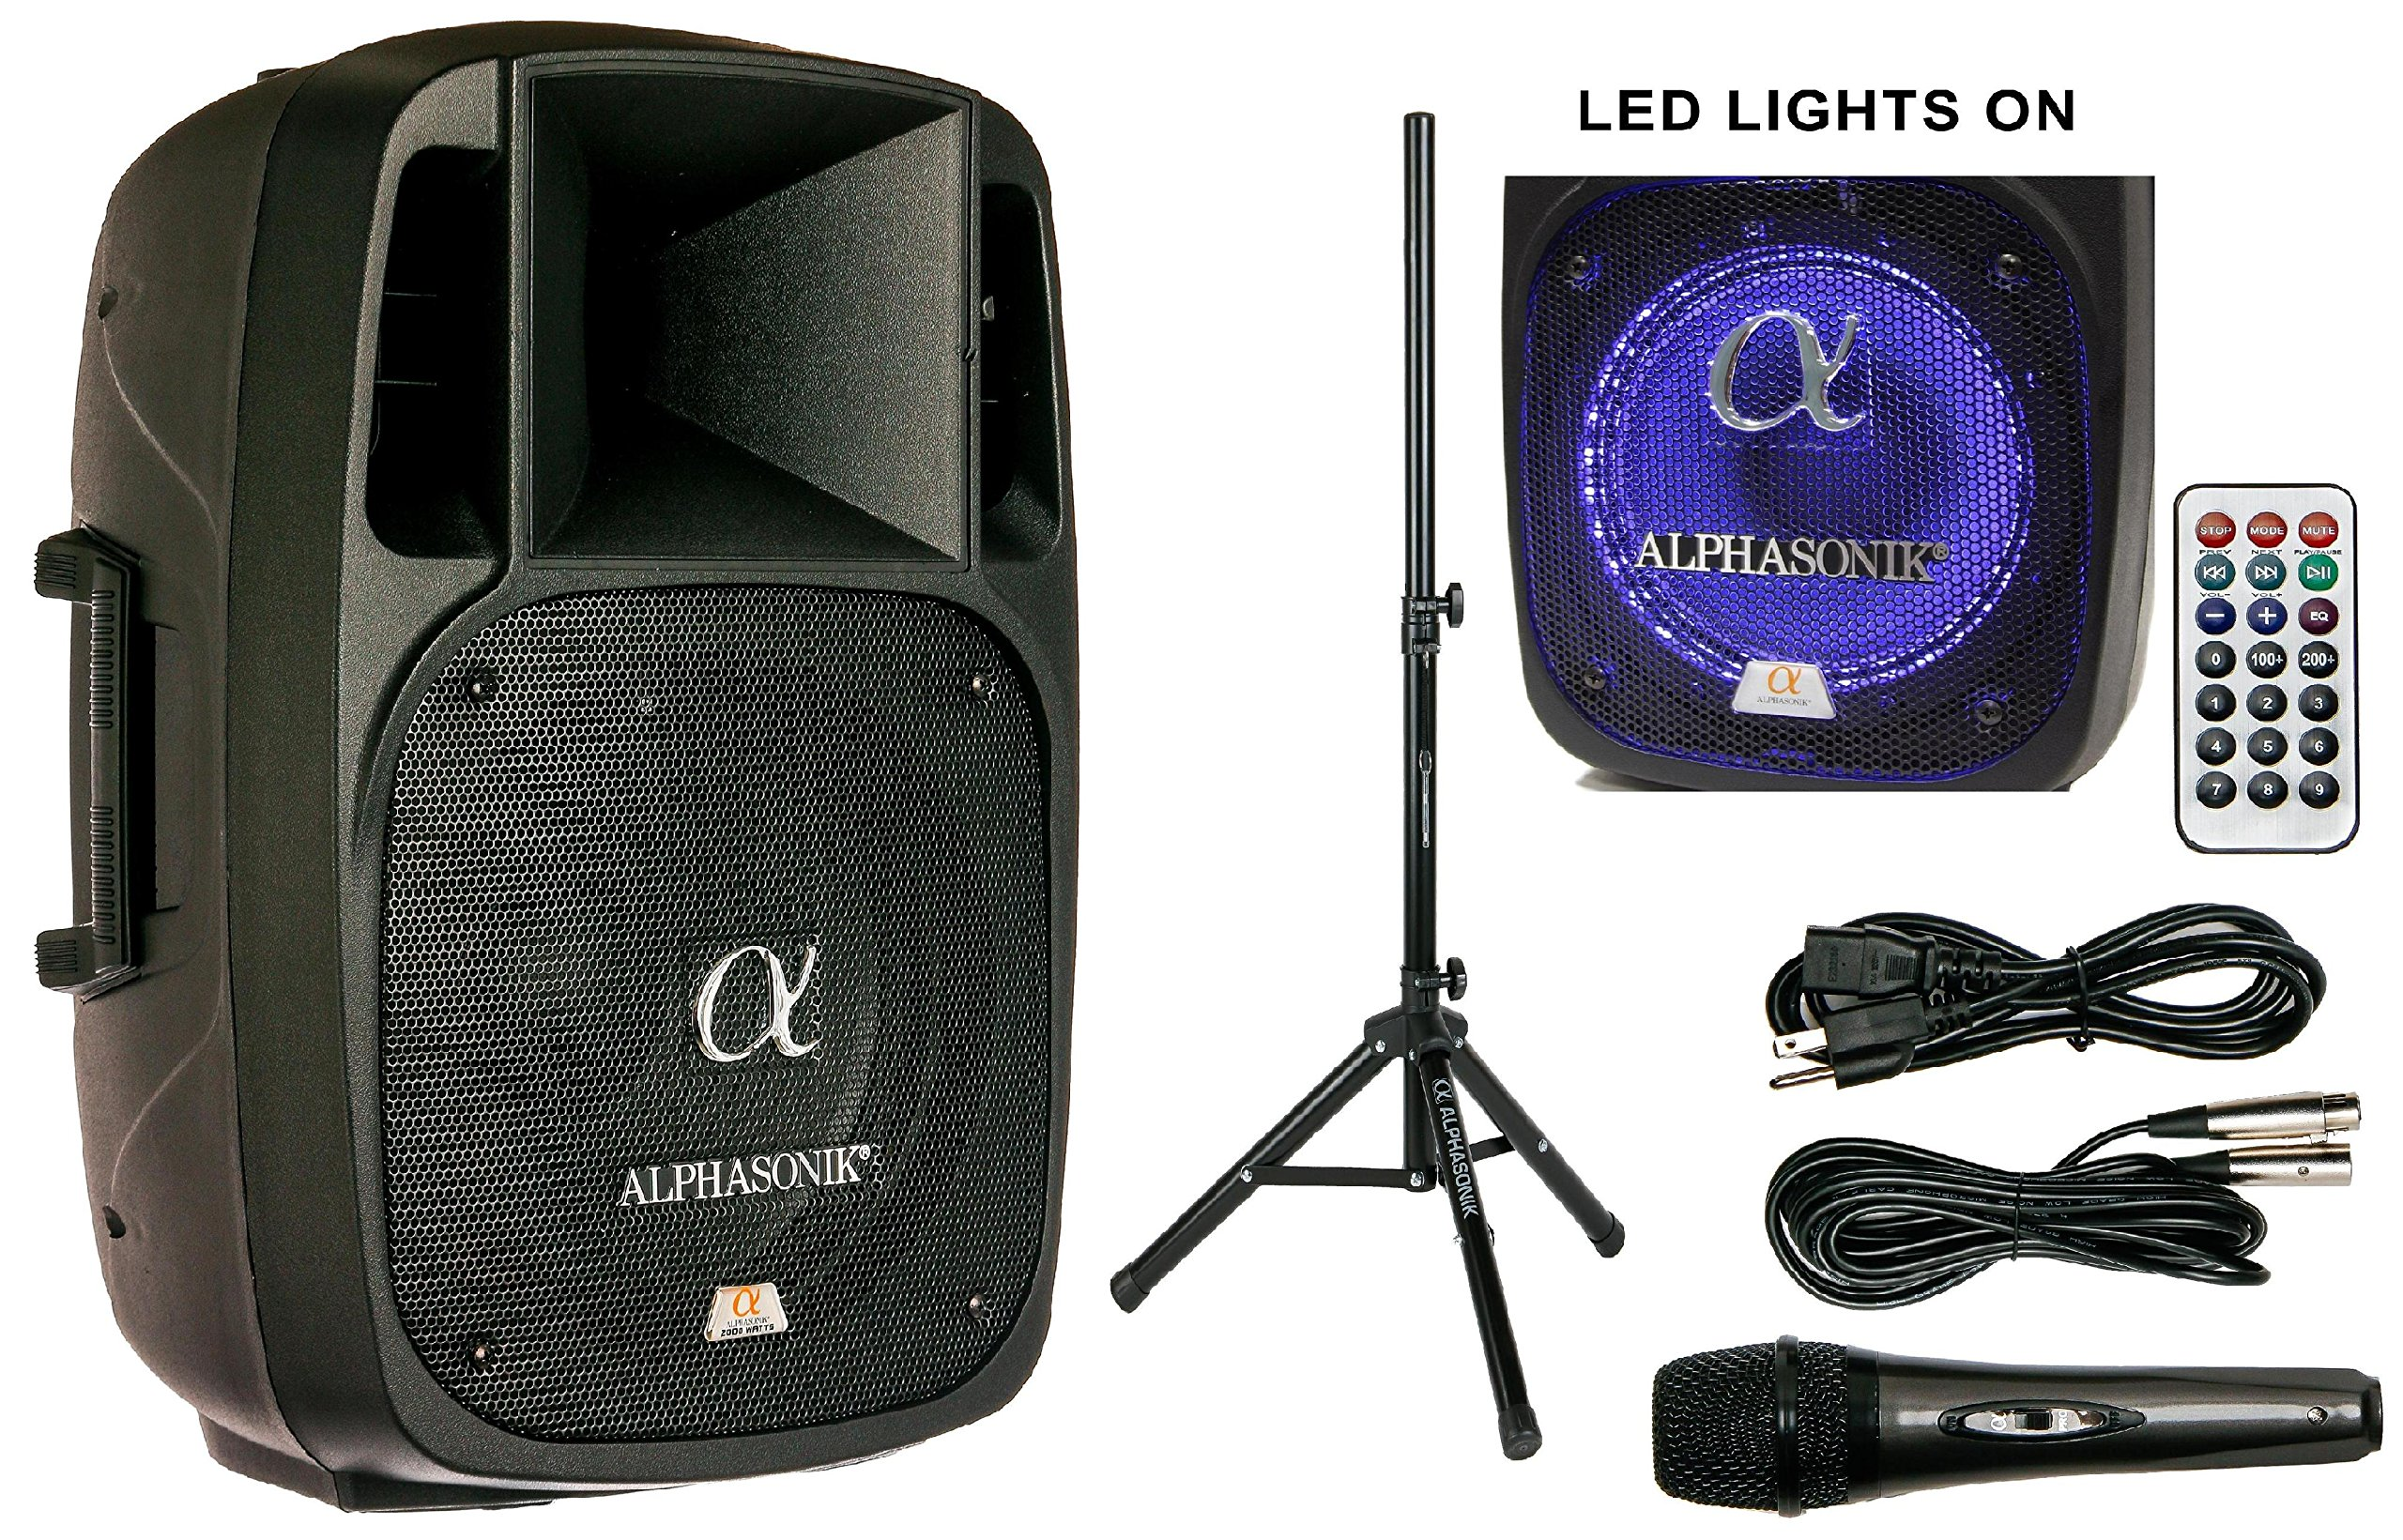 Alphasonik 12'' Powered 2000W PRO DJ Amplified Loud Speaker Bluetooth USB SD Card AUX MP3 FM Radio PA System LED Ring Karaoke Mic Main Monitor, Band Church, Party, Guitar Amp, Home, BBQ w/ Tripod Stand